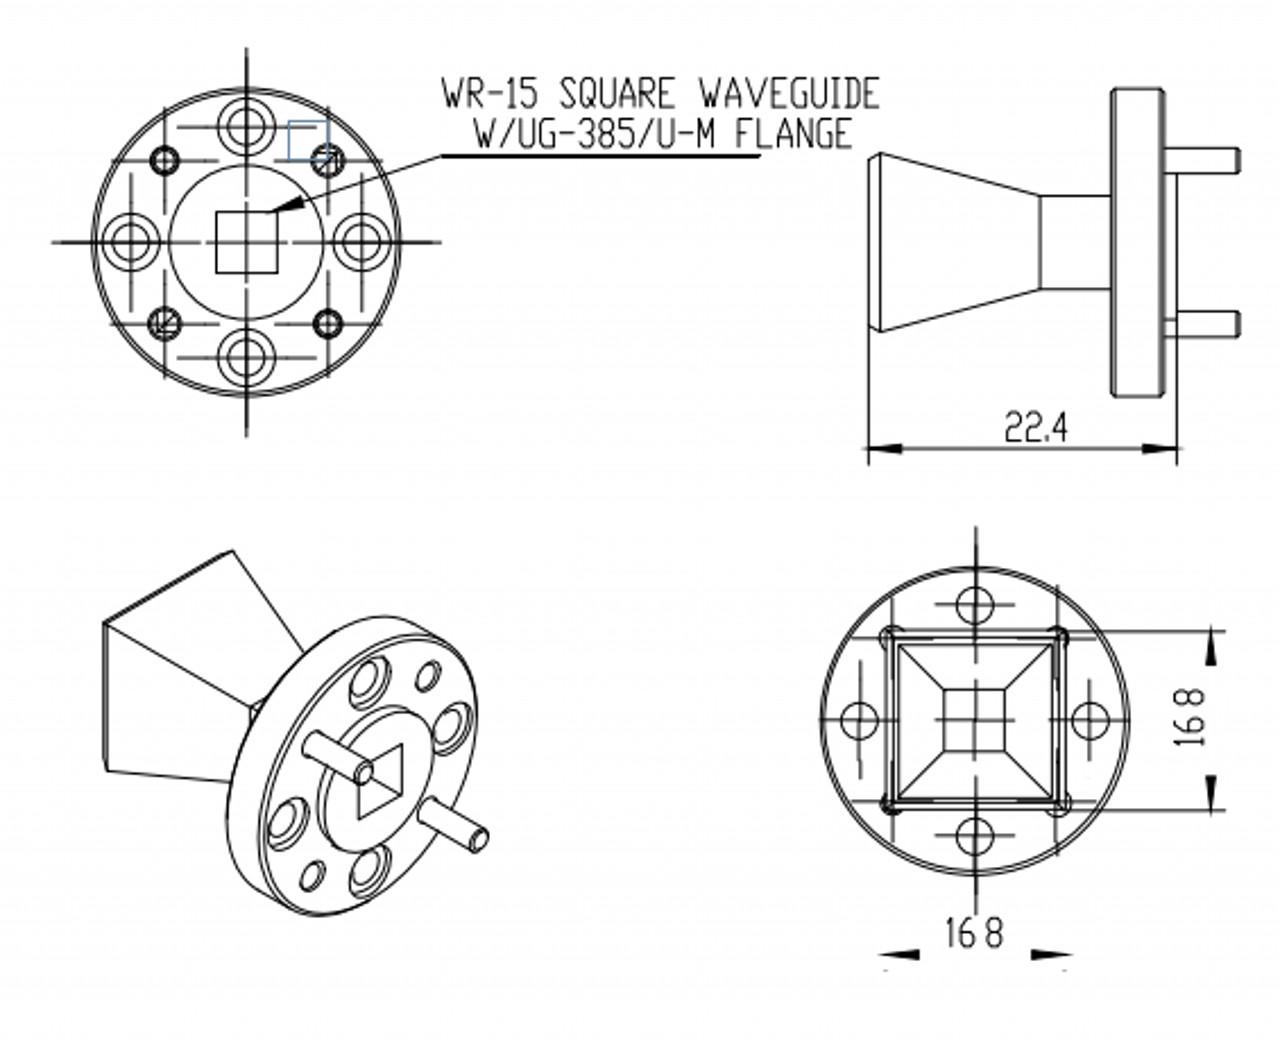 15 dBi Gain, 50 GHz to 75 GHz, WR-15 Waveguide Millimeter SGH Antenna